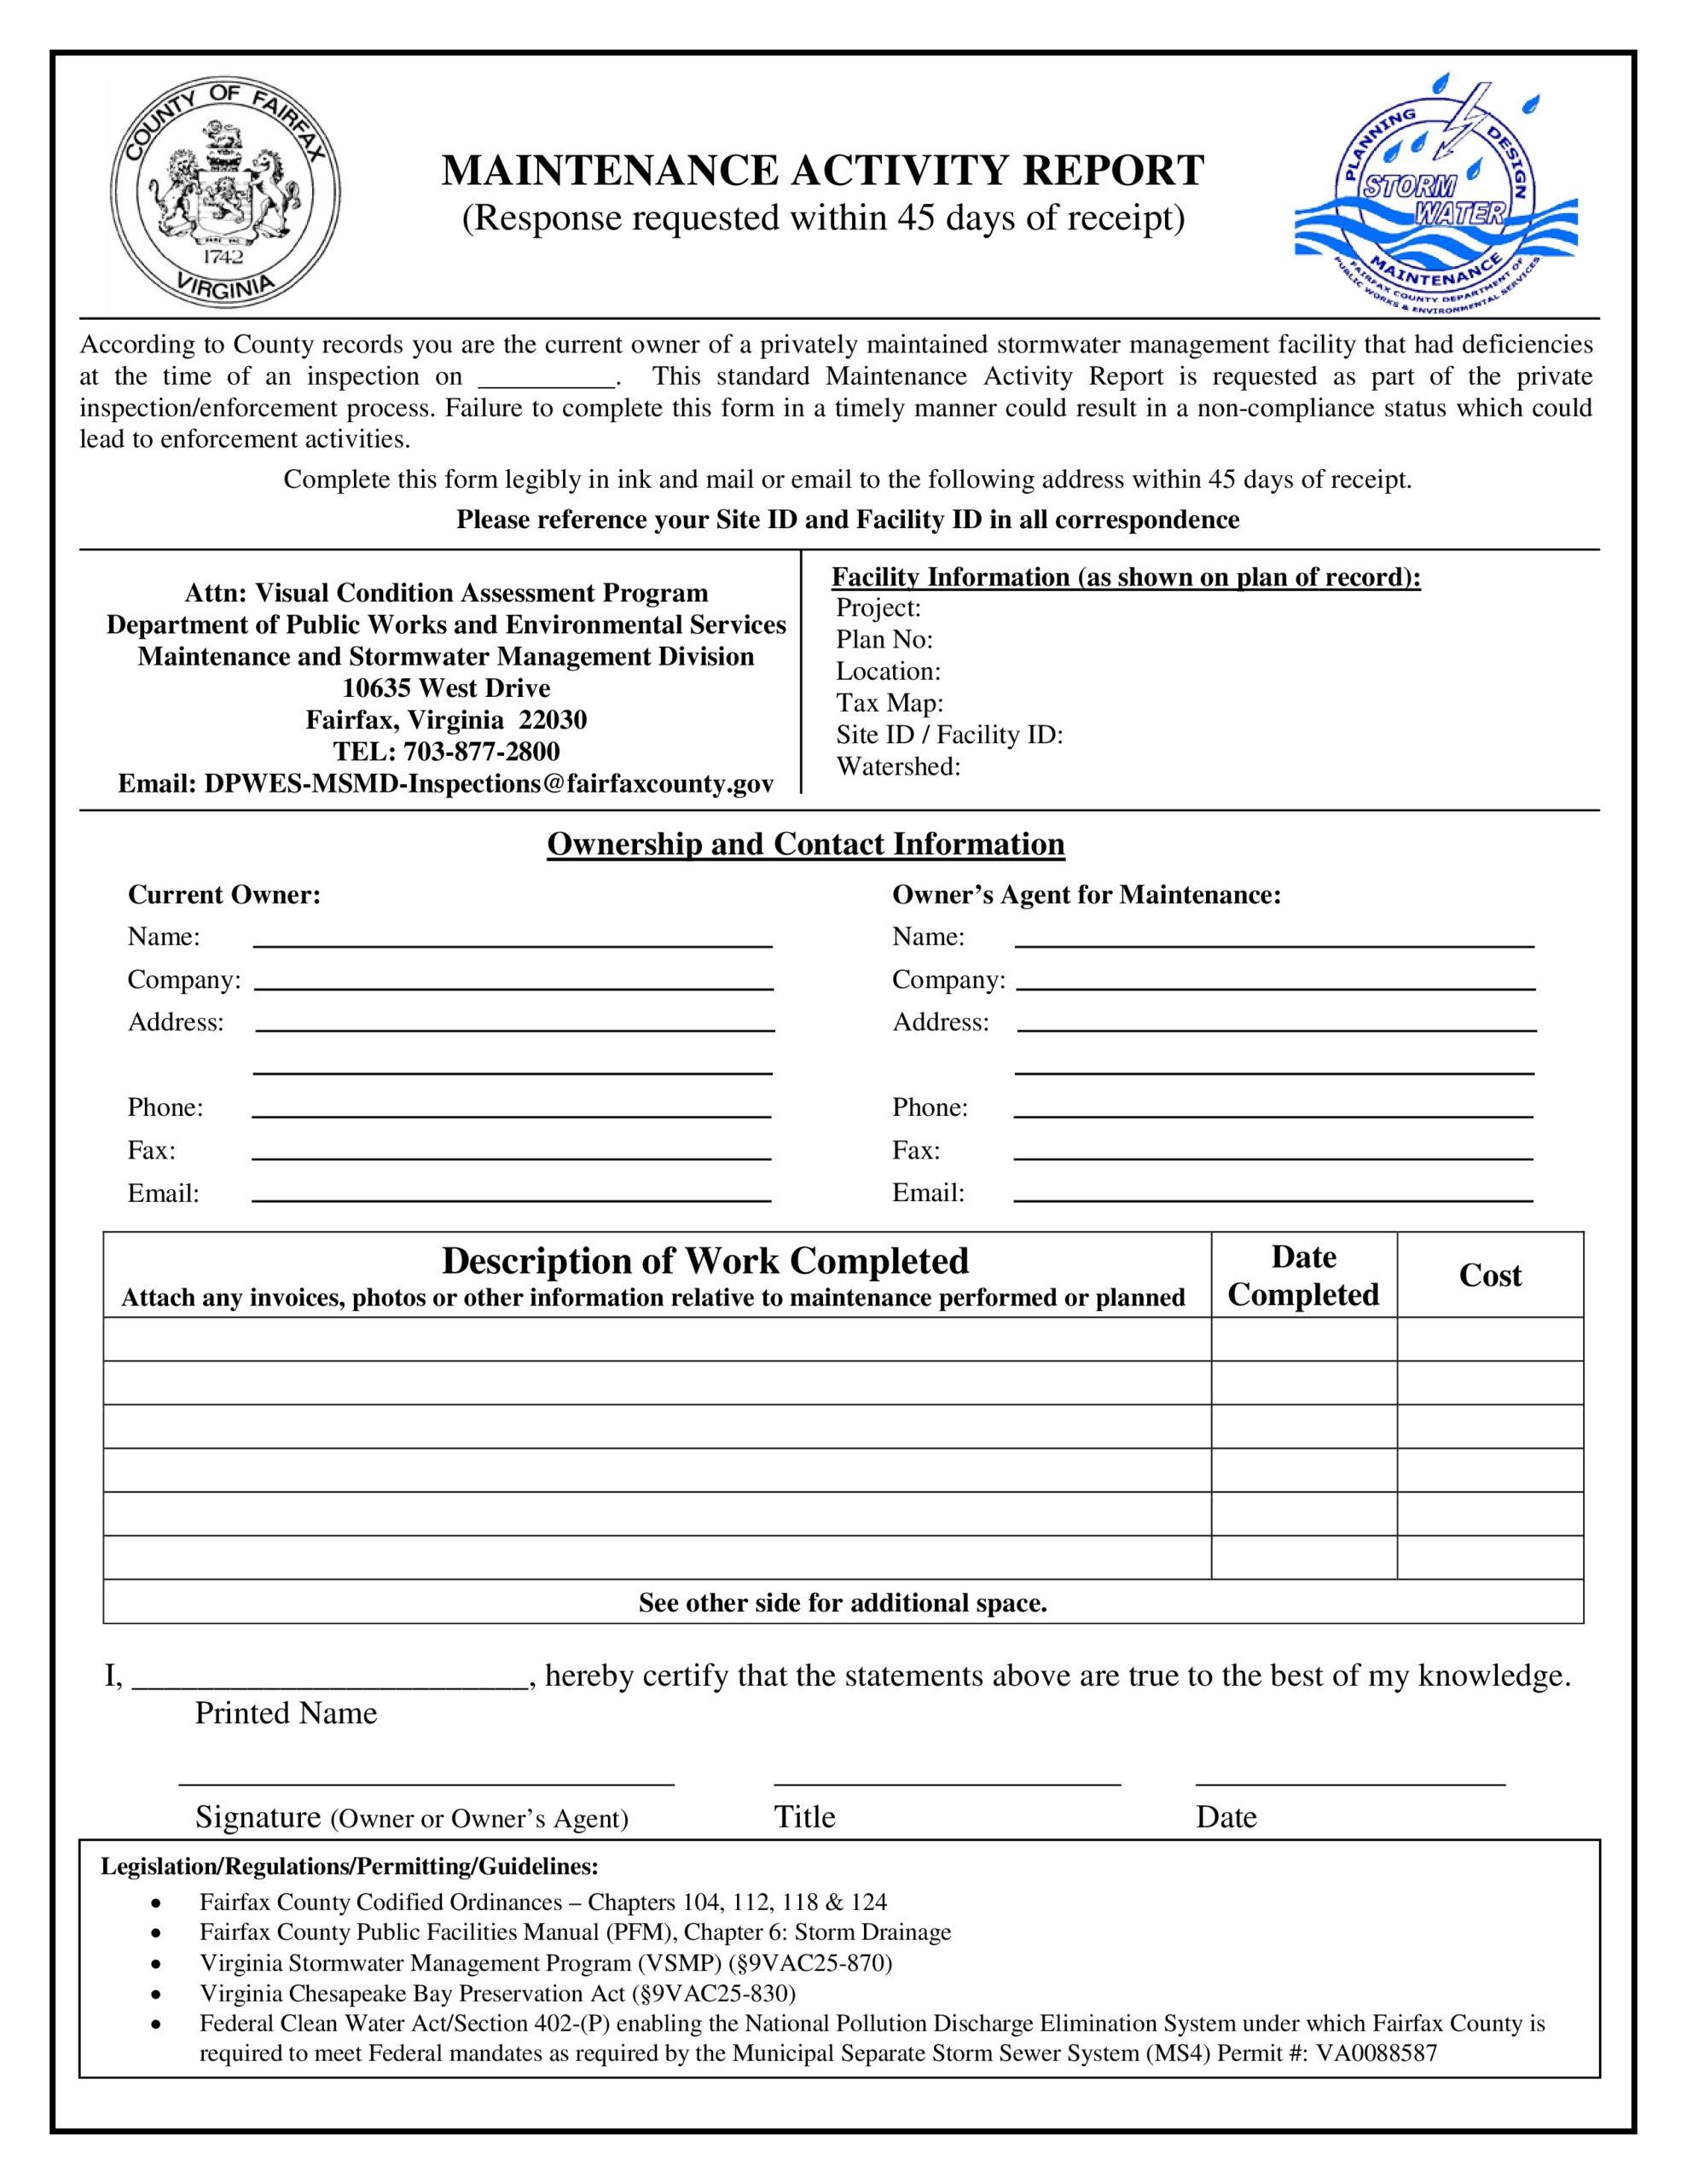 Free maintenance report form 33